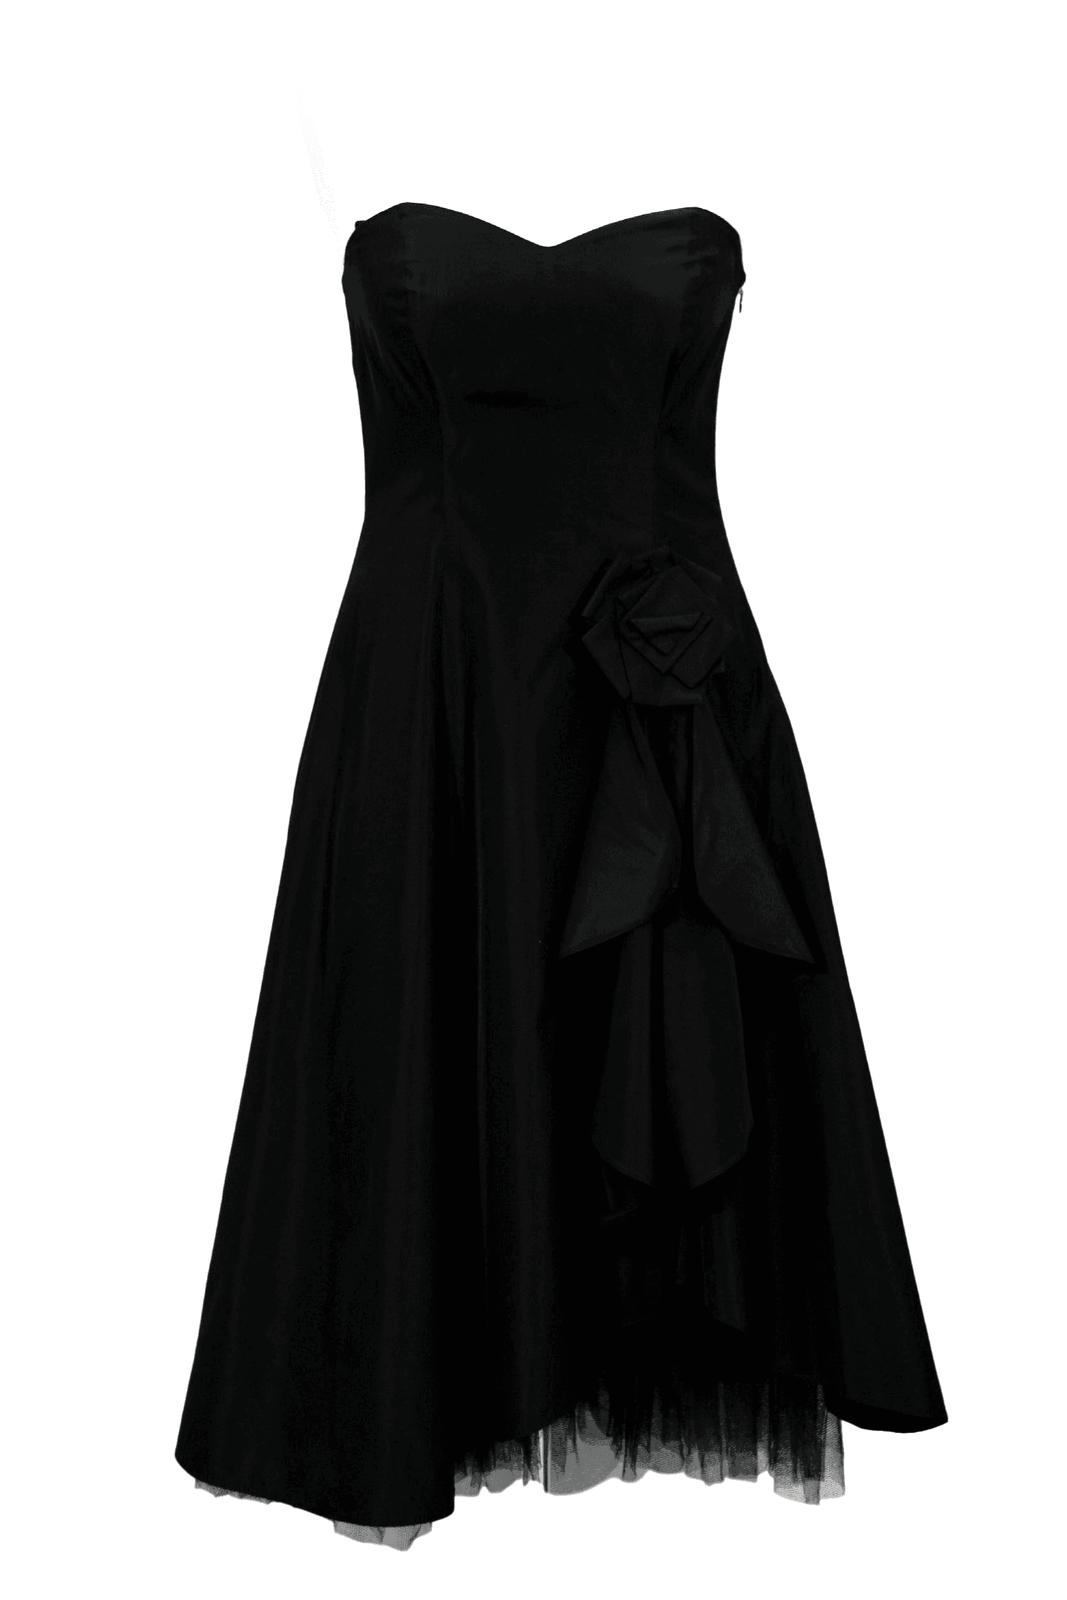 Debut Kleid Damen Gr. 36 (UK10) Schwarz Shiftkleid Shirtkleid Dress Midikleid